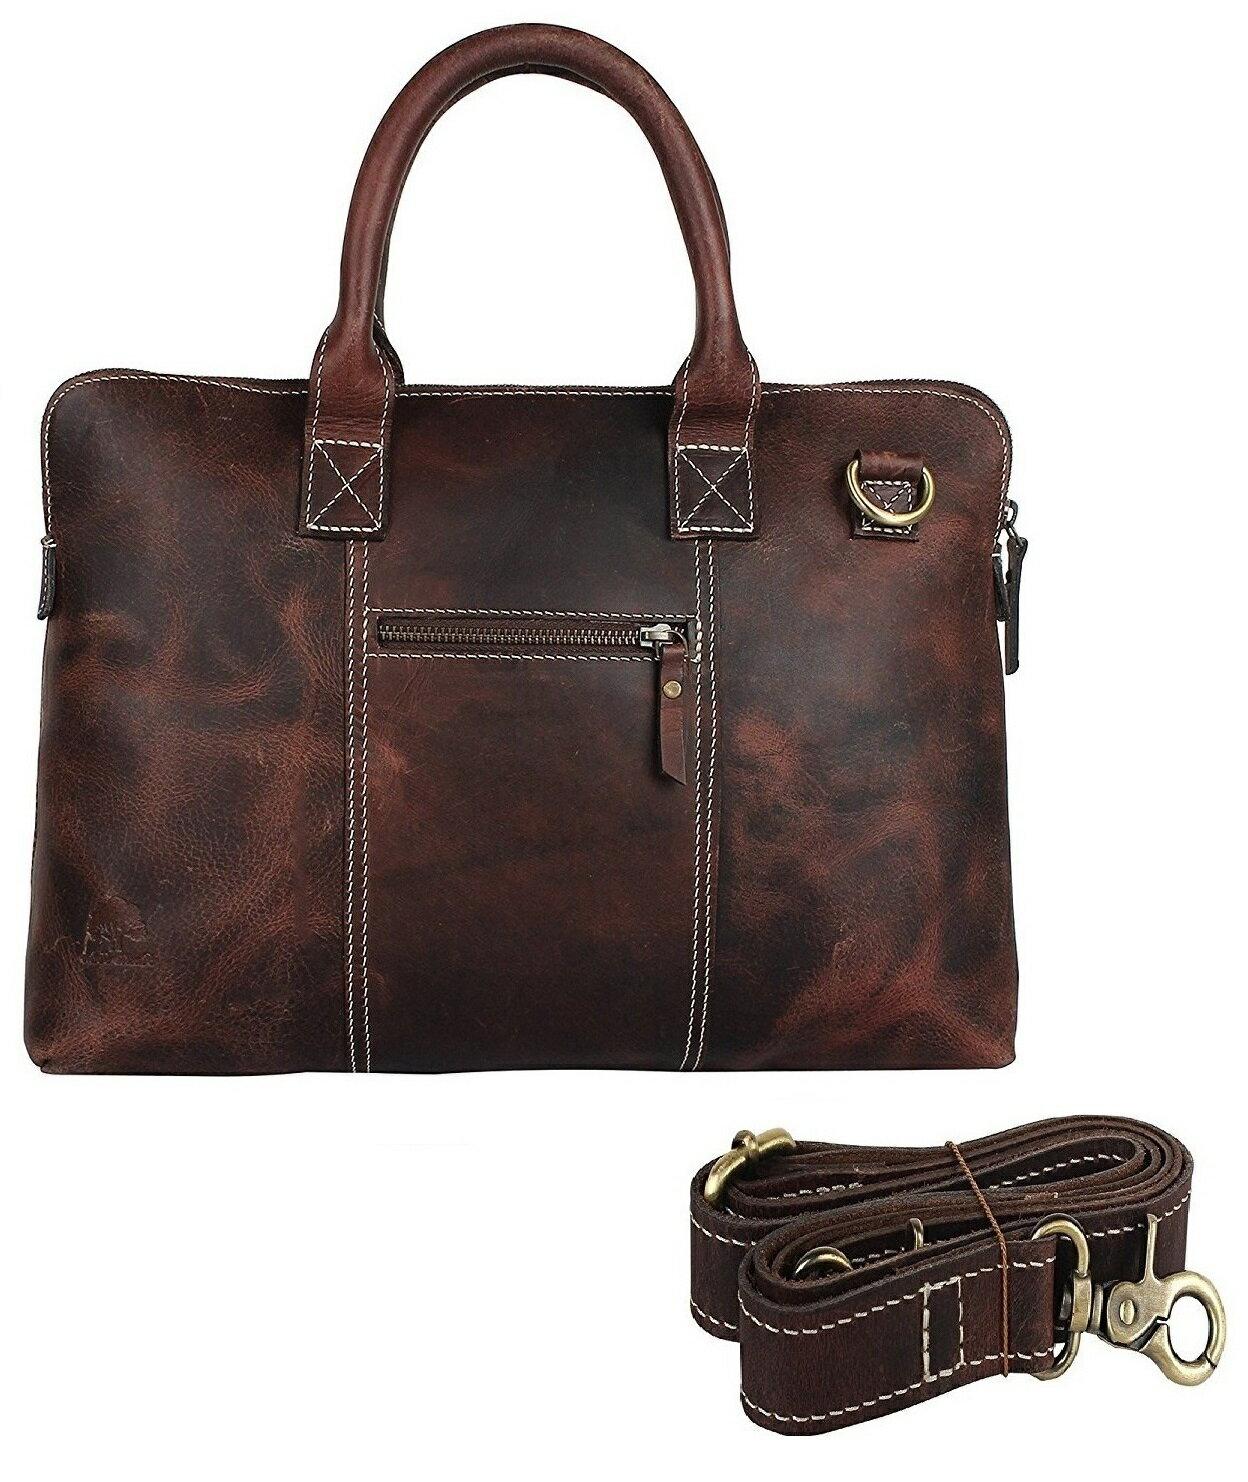 14 inch Genuine Leather Briefcase Bag - Crossbody Laptop Satchel by Rustic  Town 0 da2b67a5578fc